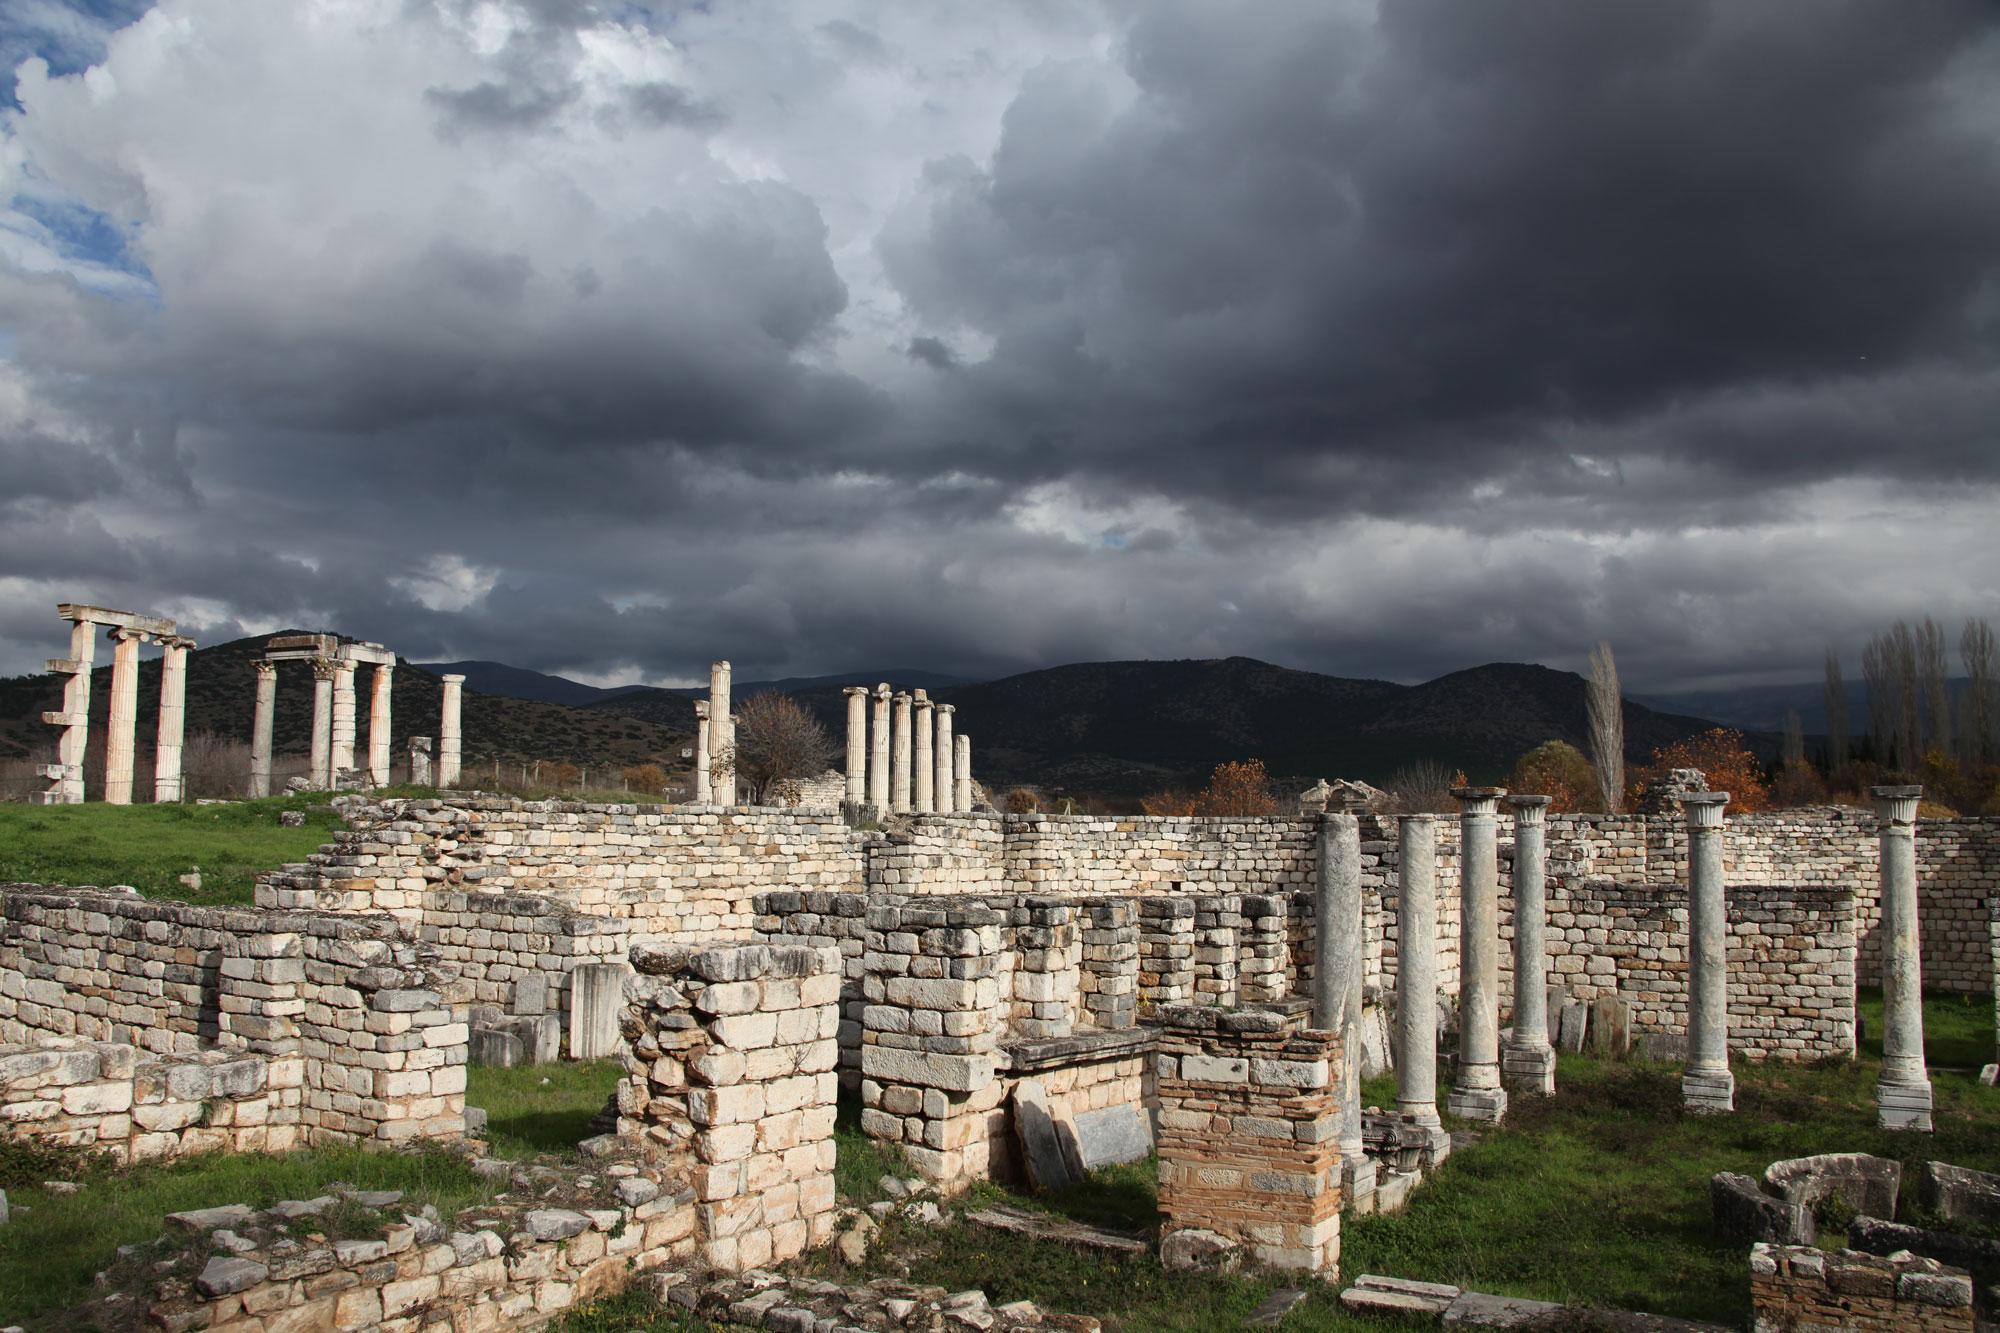 Studienreise Nordzypern / Türkei - 03.-10.12.2014